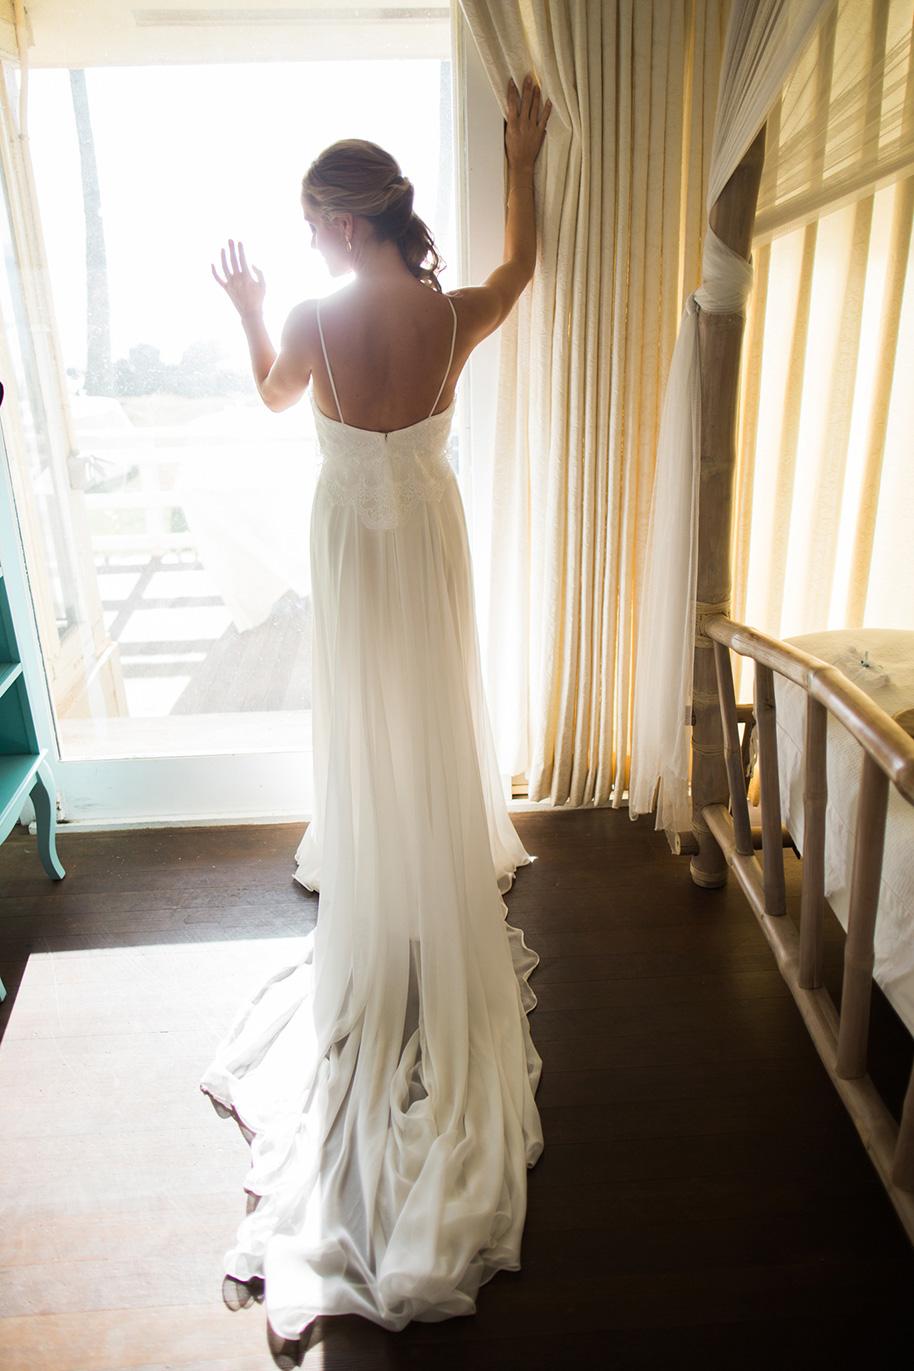 Maui-Wedding-060216-3